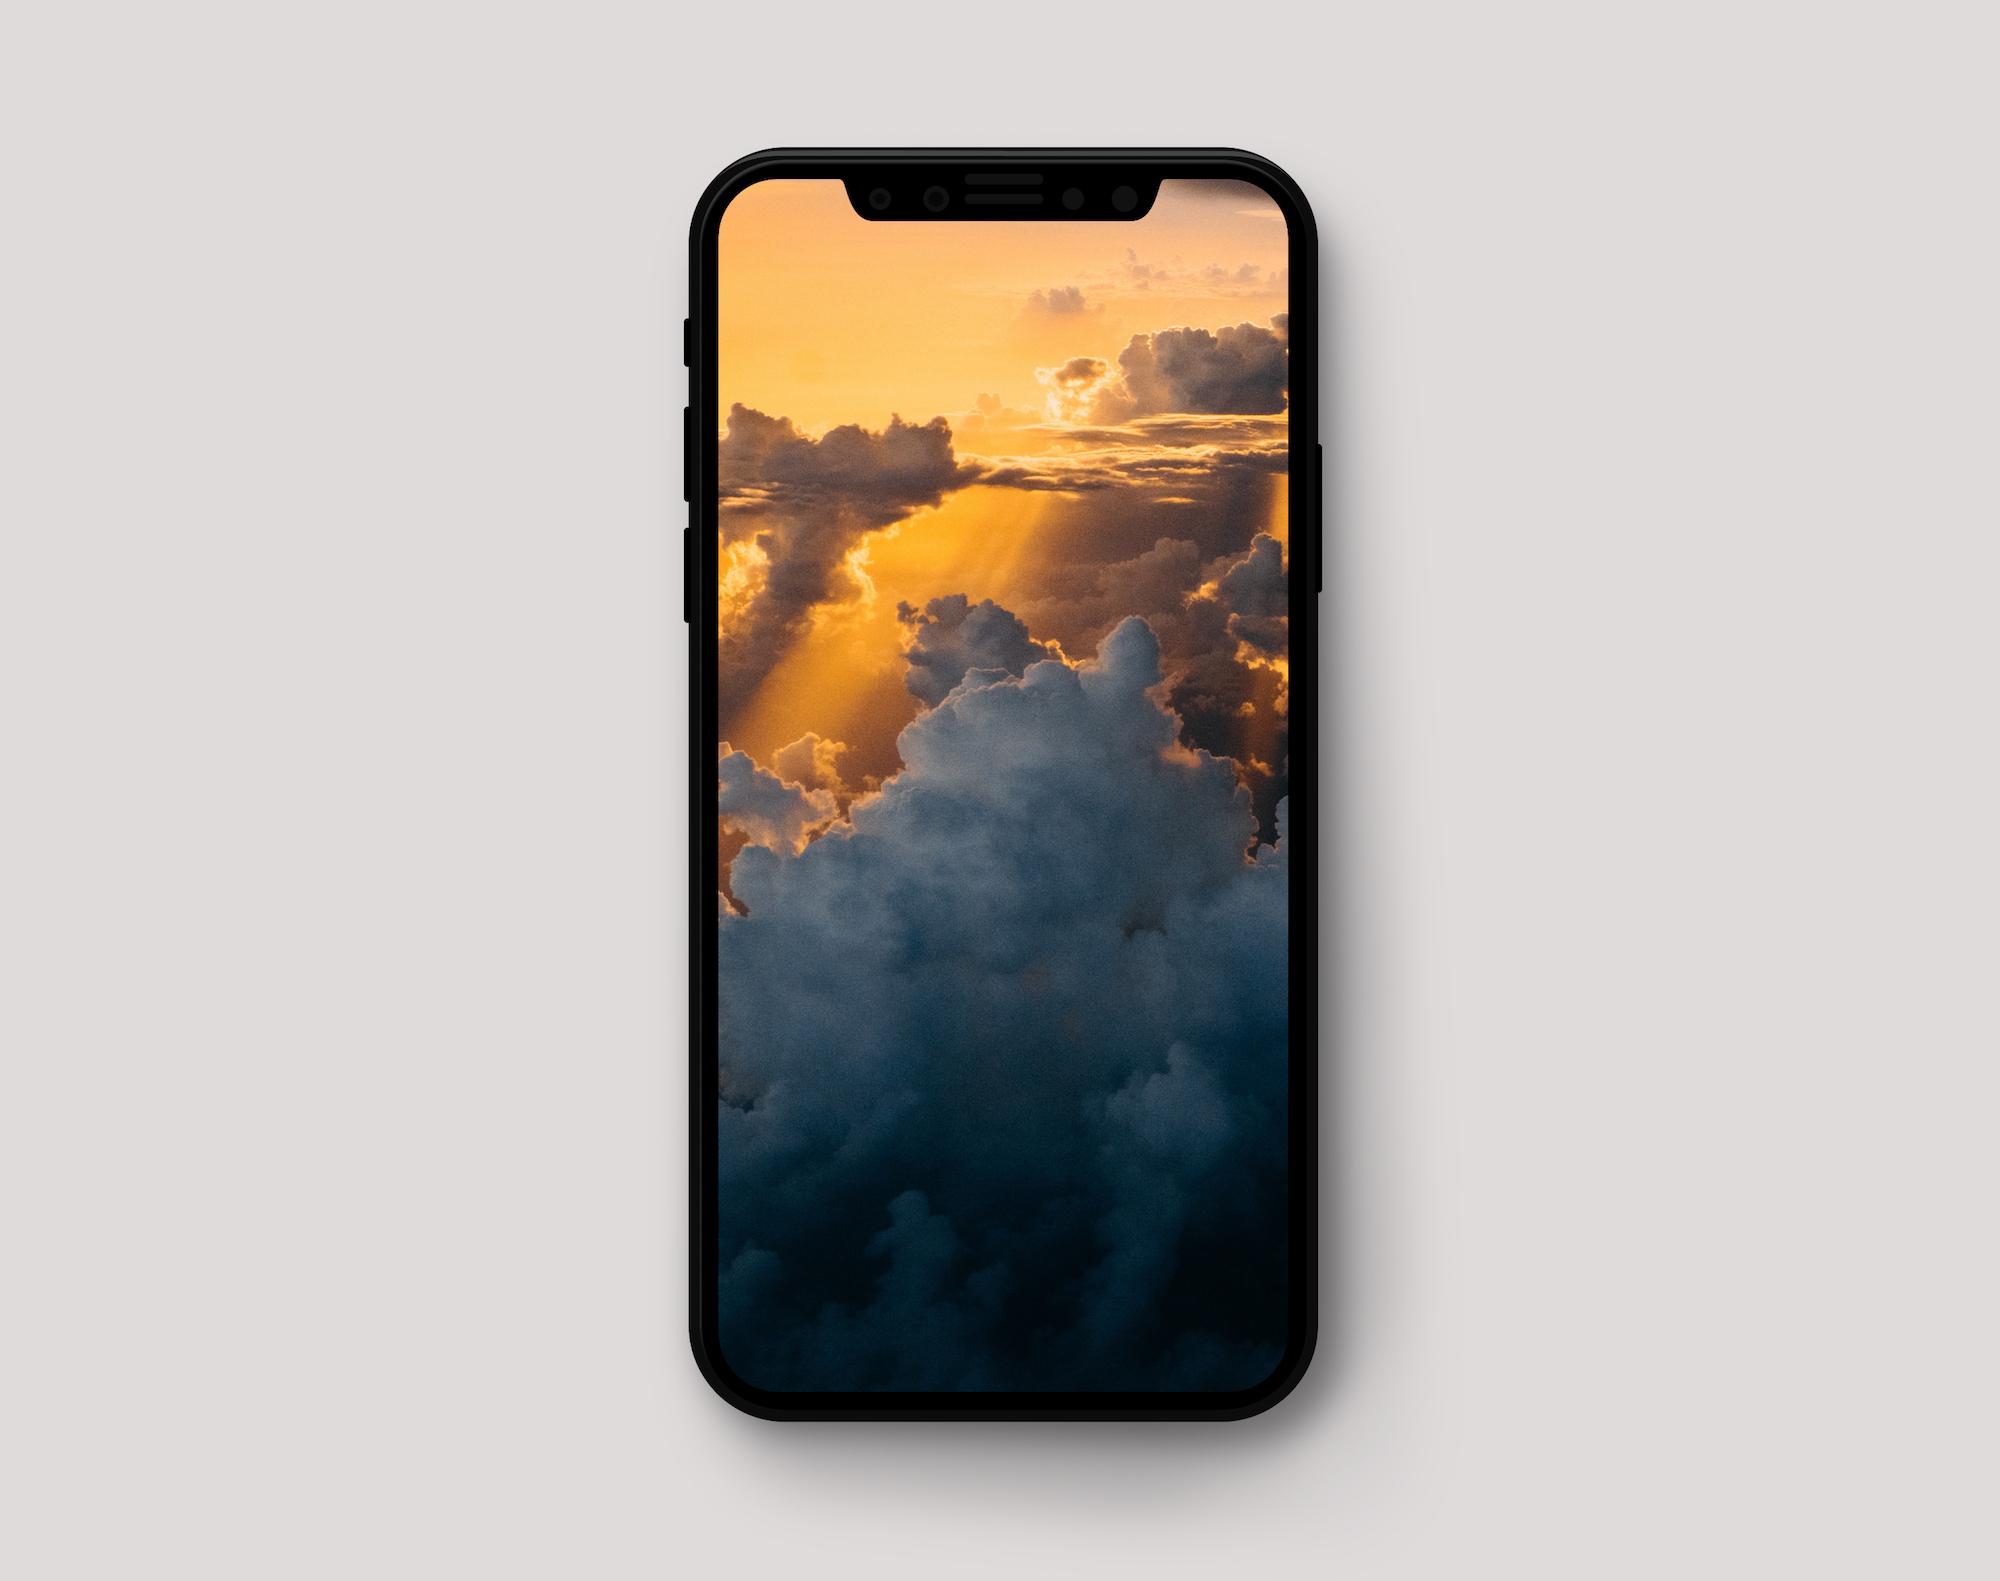 iPhone X Wallpaper Pack 3 2000x1581